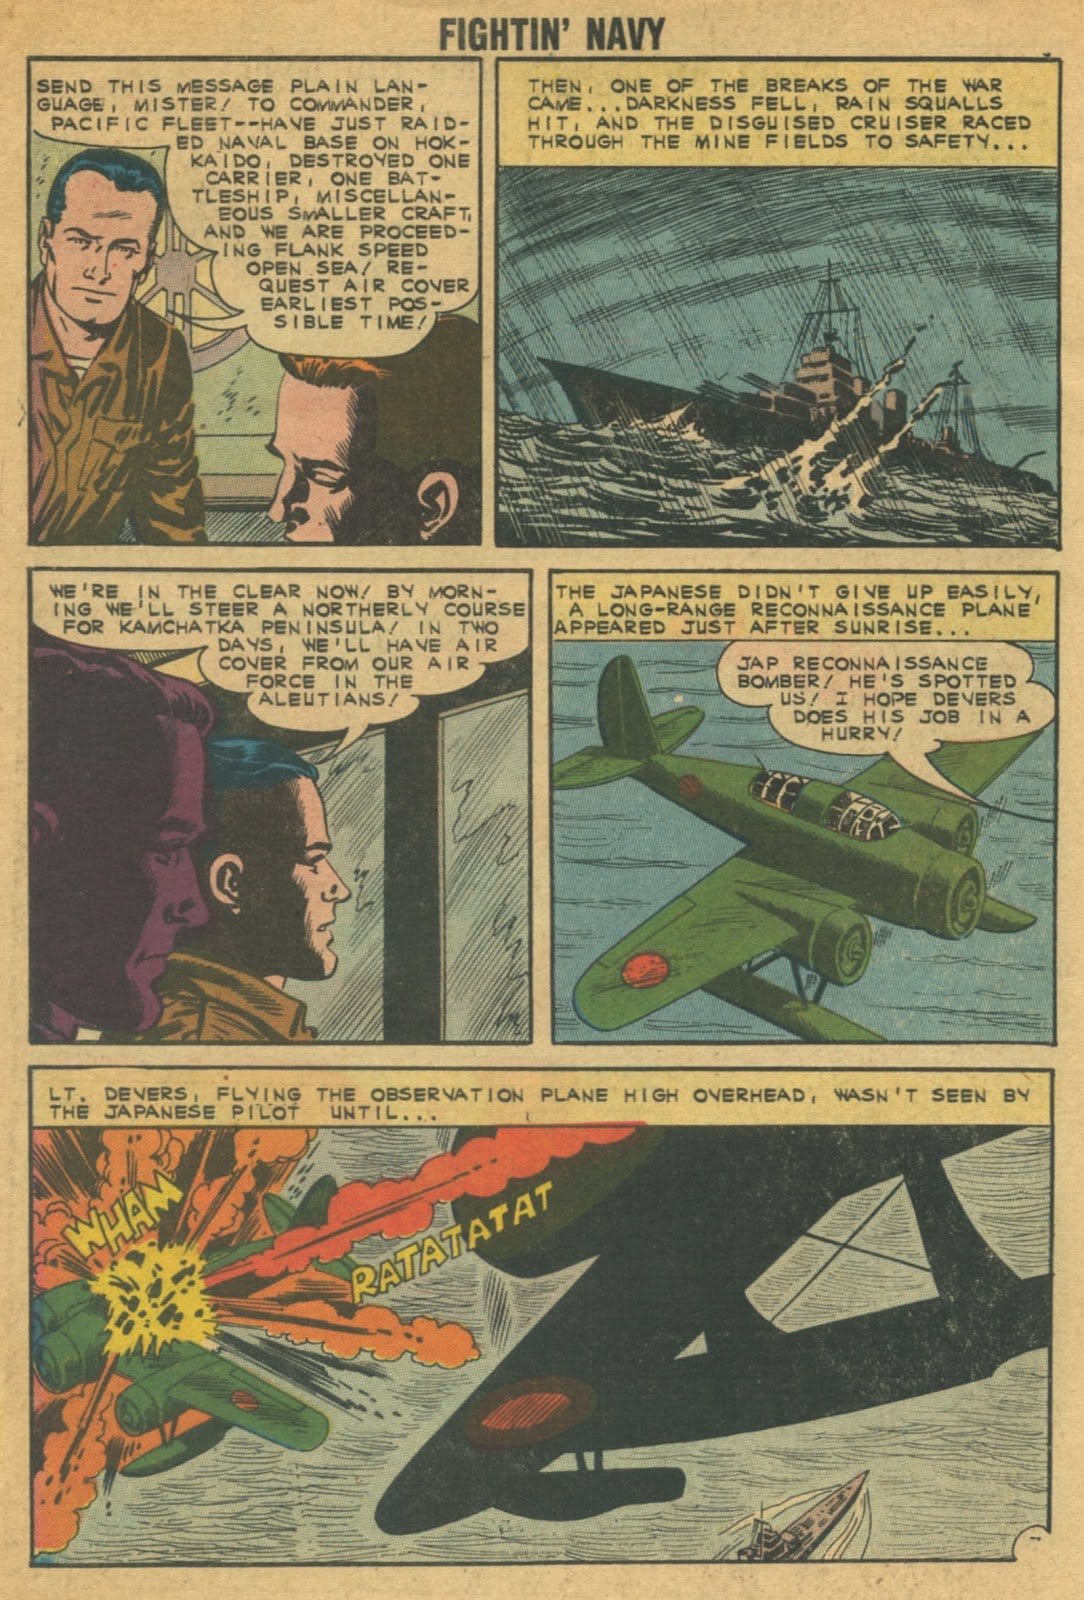 Read online Fightin' Navy comic -  Issue #103 - 10